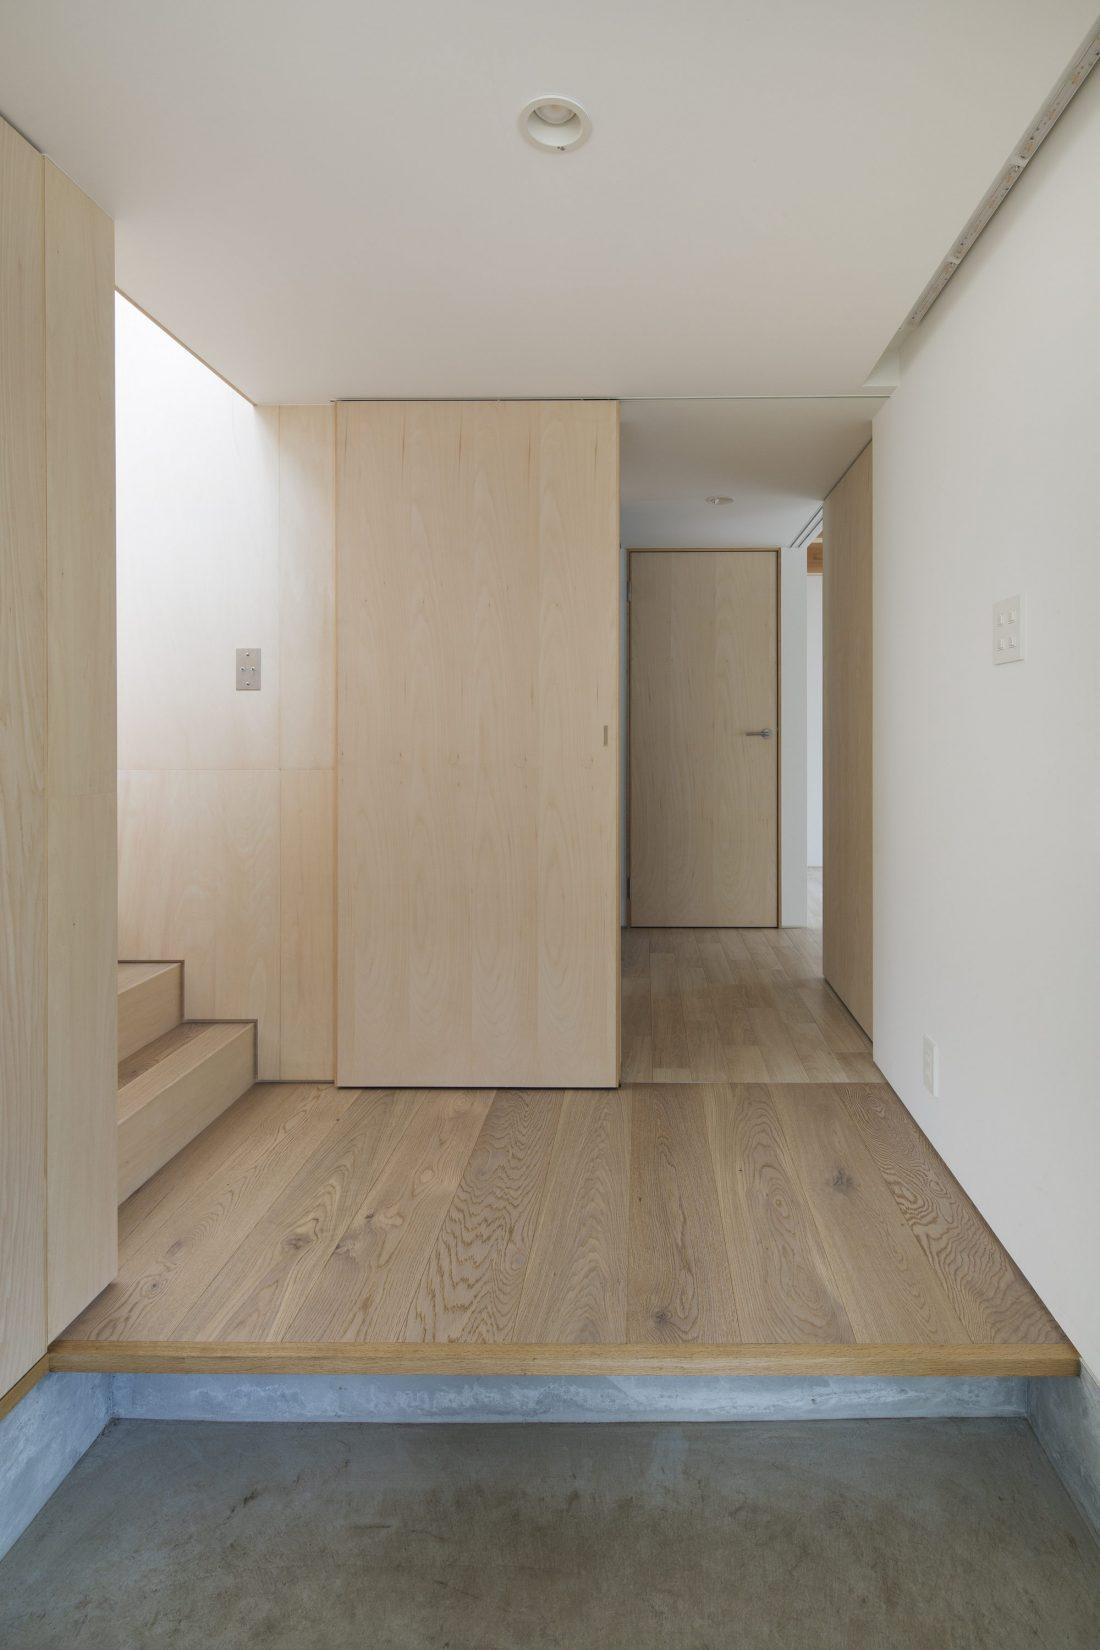 Дом в Токио по системе Shakkanho по проекту Tetsuo Yamaji 7